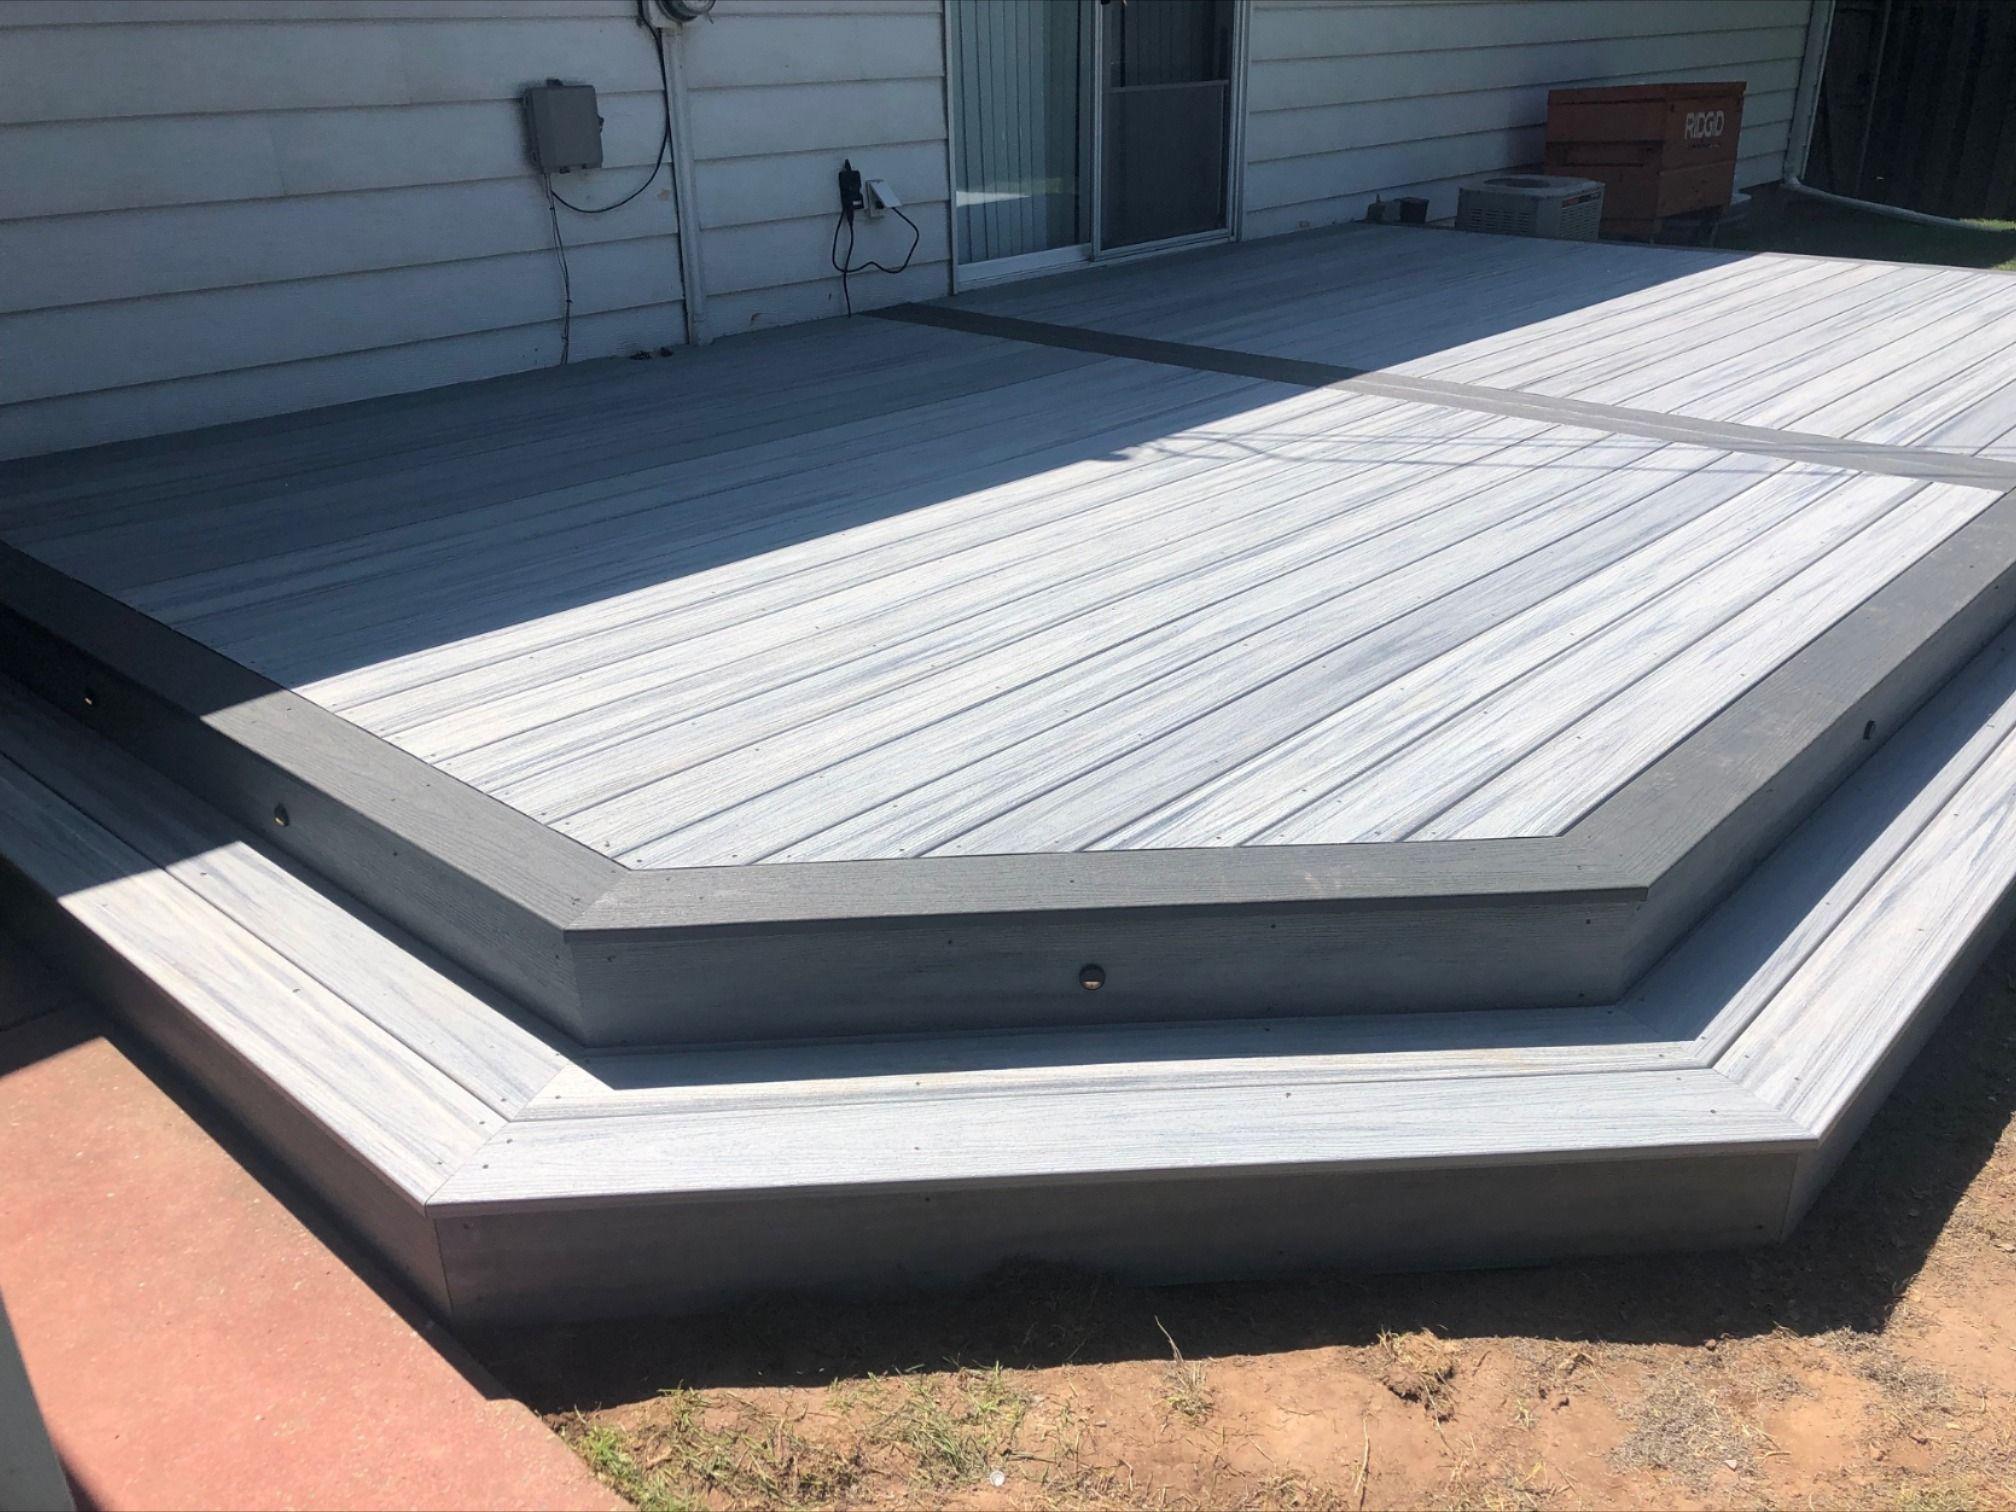 Trex Deck In Foggy Wharf Enhance And Pebble Gray Select Small Backyard Decks Trex Patio Deck Designs Backyard